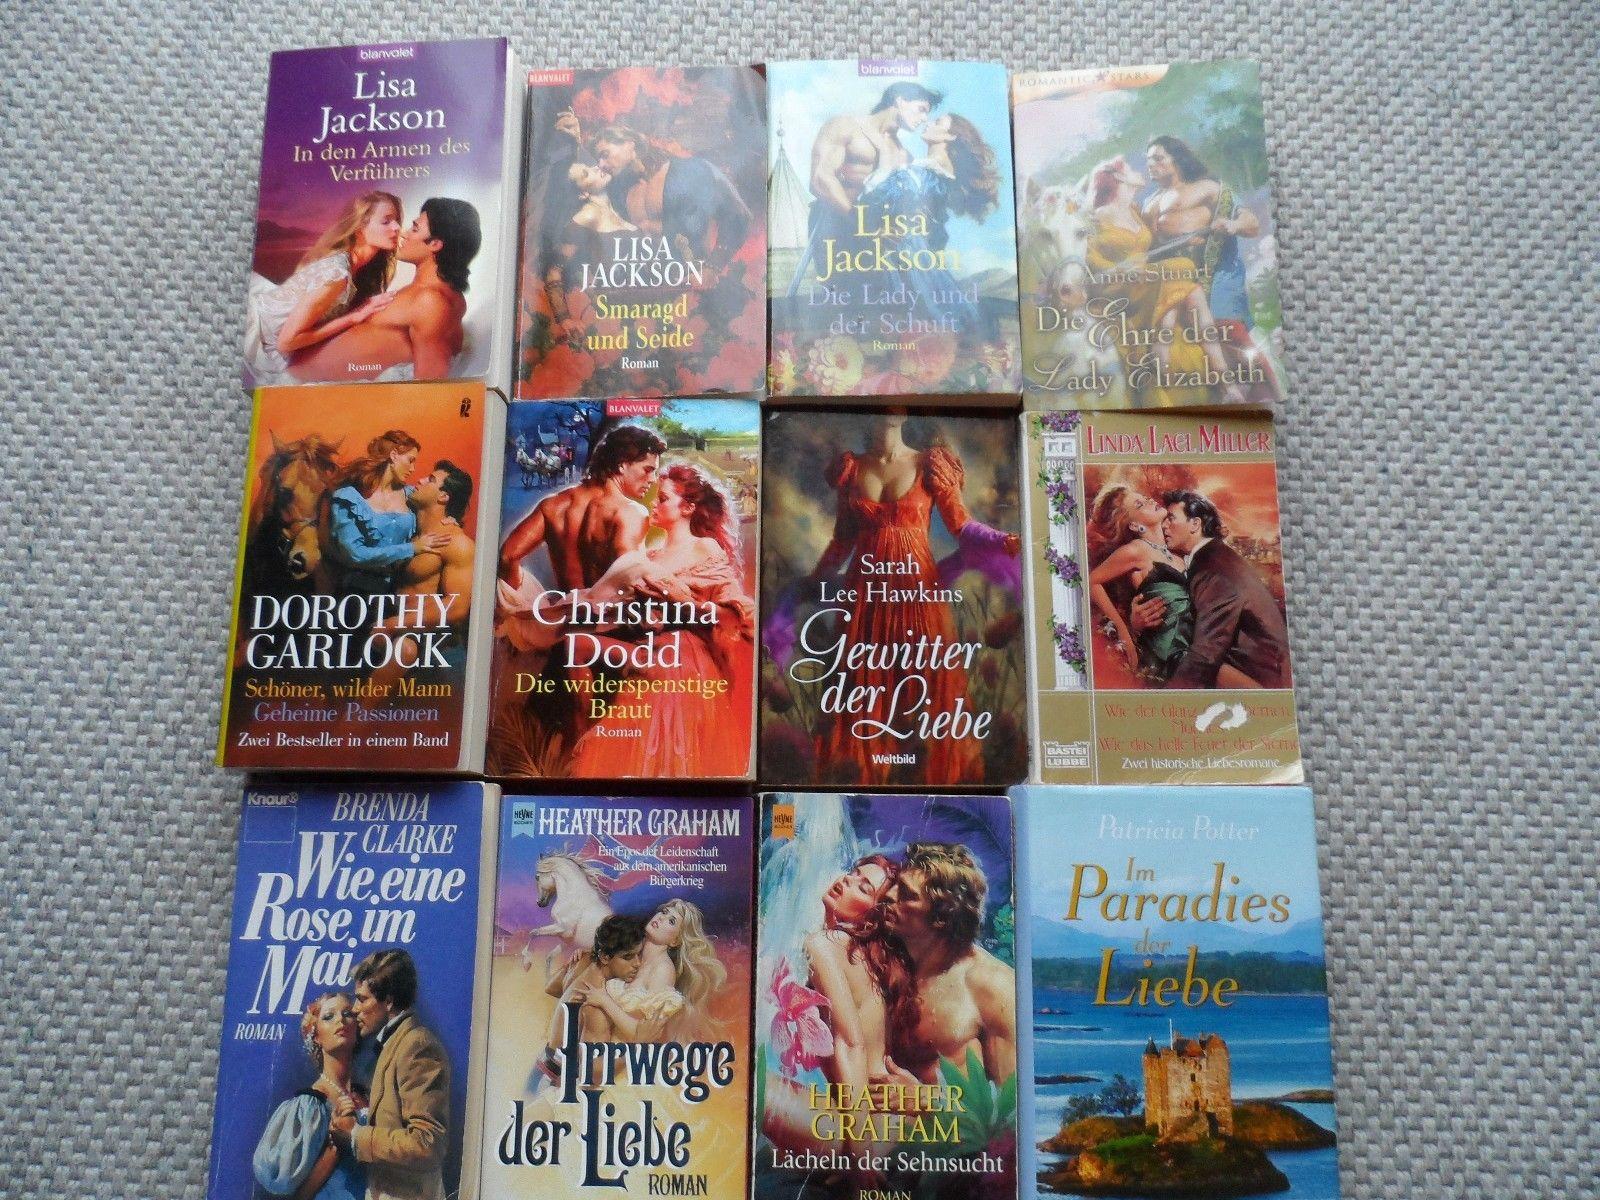 Paket - 12 Romane Liebe Romantik  -  Jackson, Garlock, Dodd, Graham, Potter ....